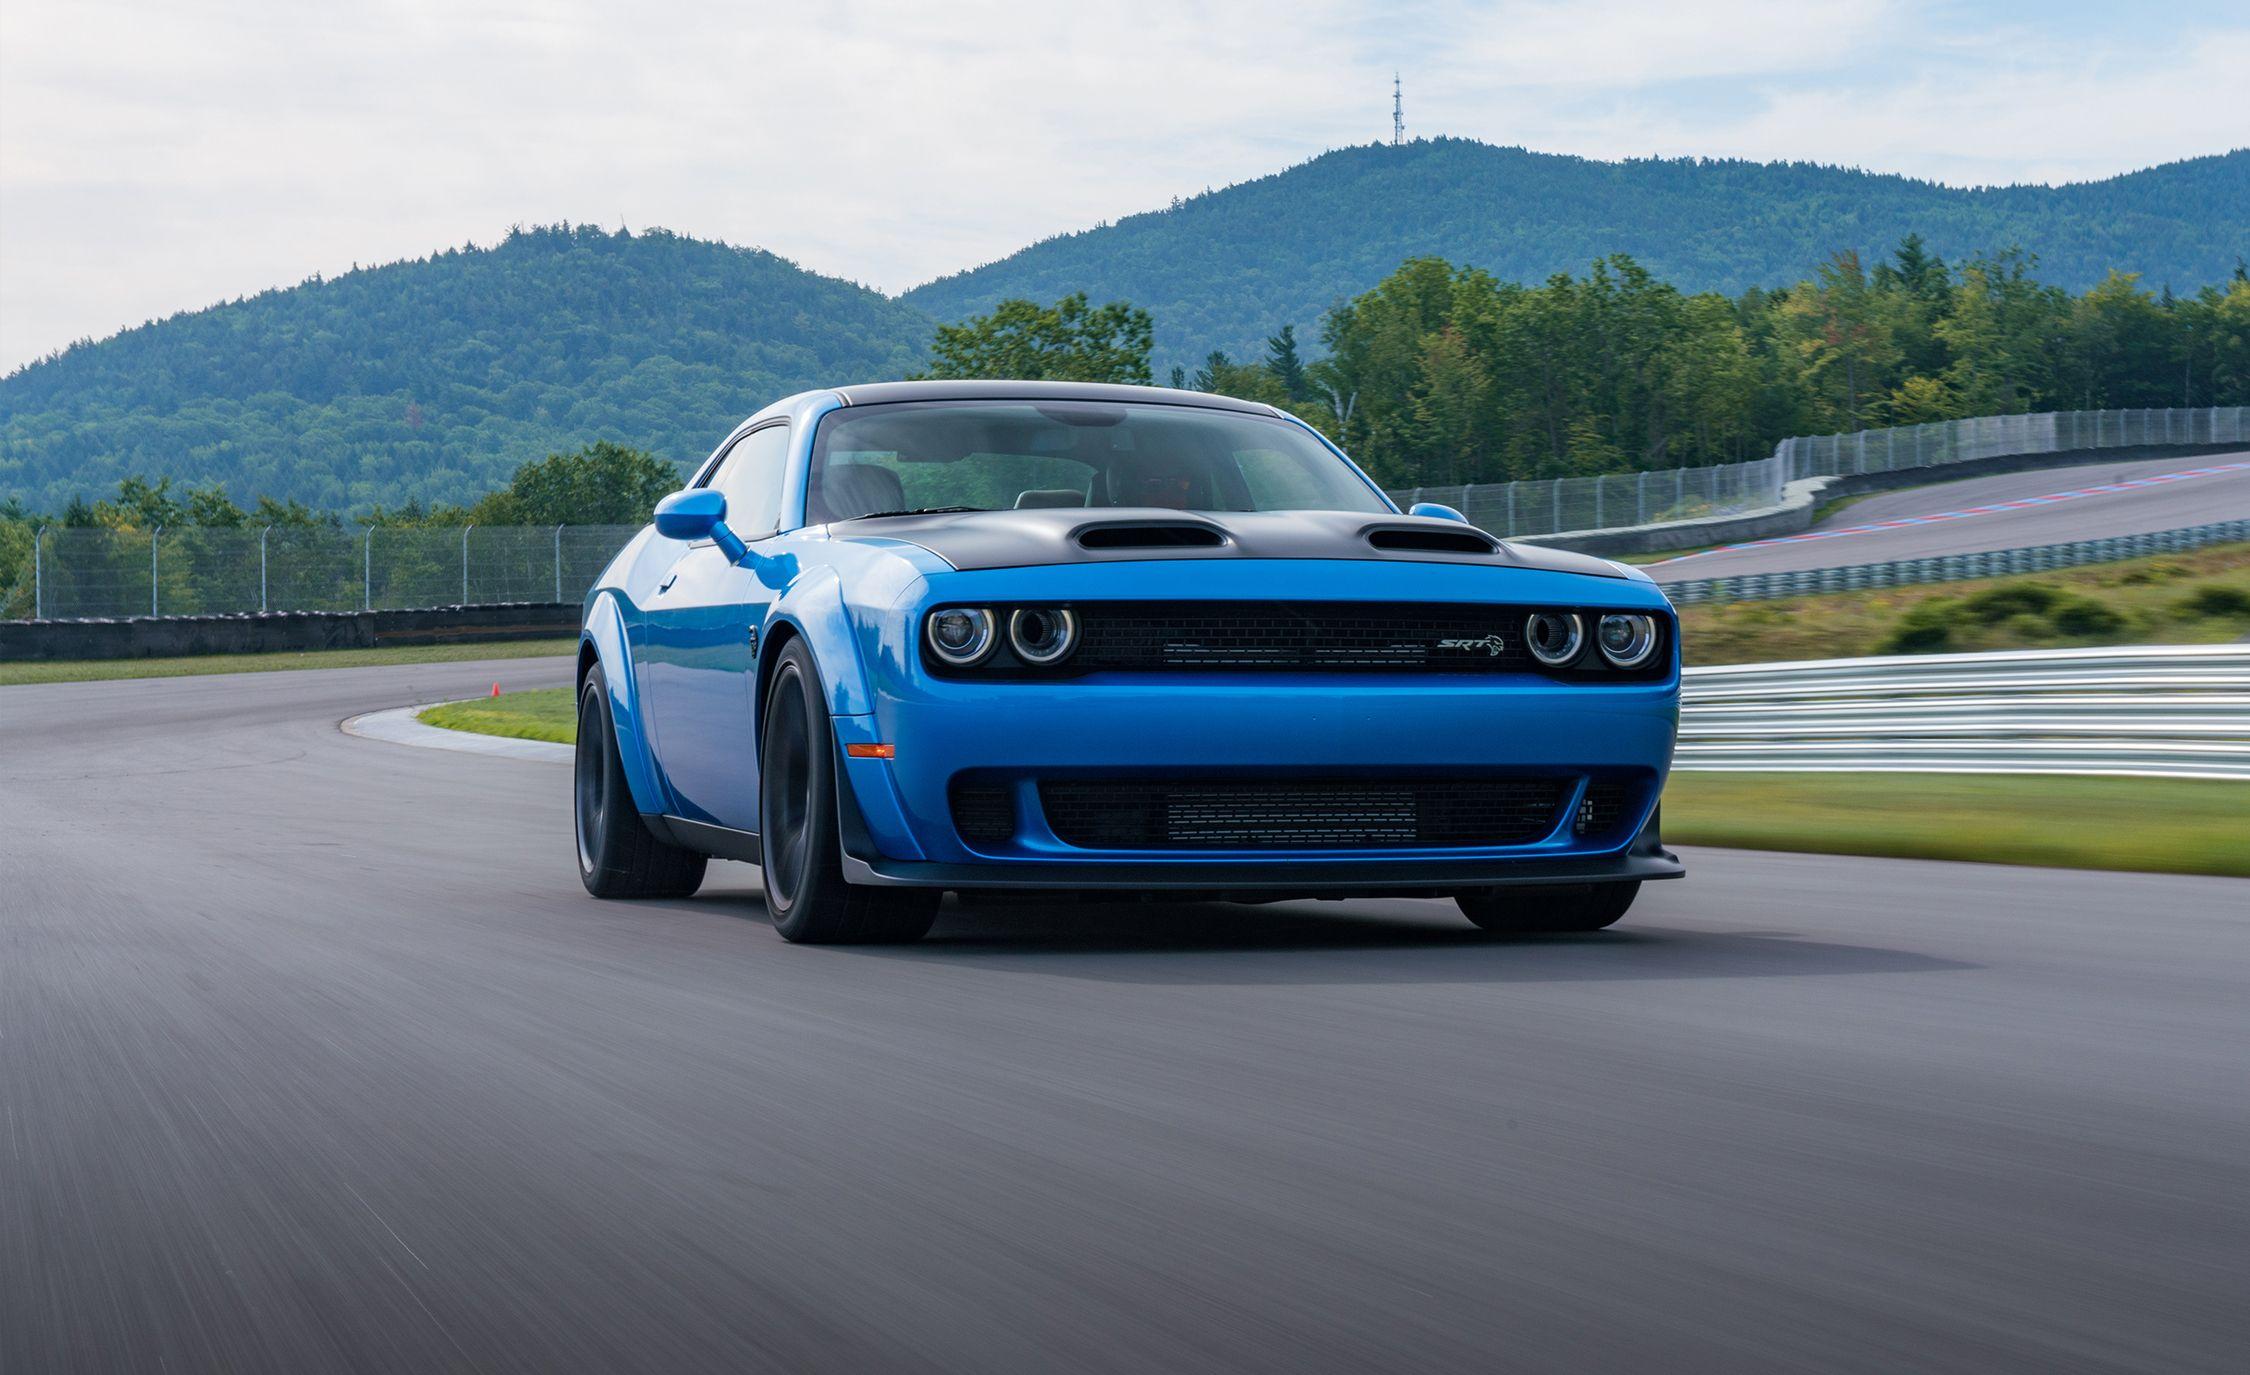 2019 Dodge Challenger Srt Hellcat Redeye Driven Mergen Tools New